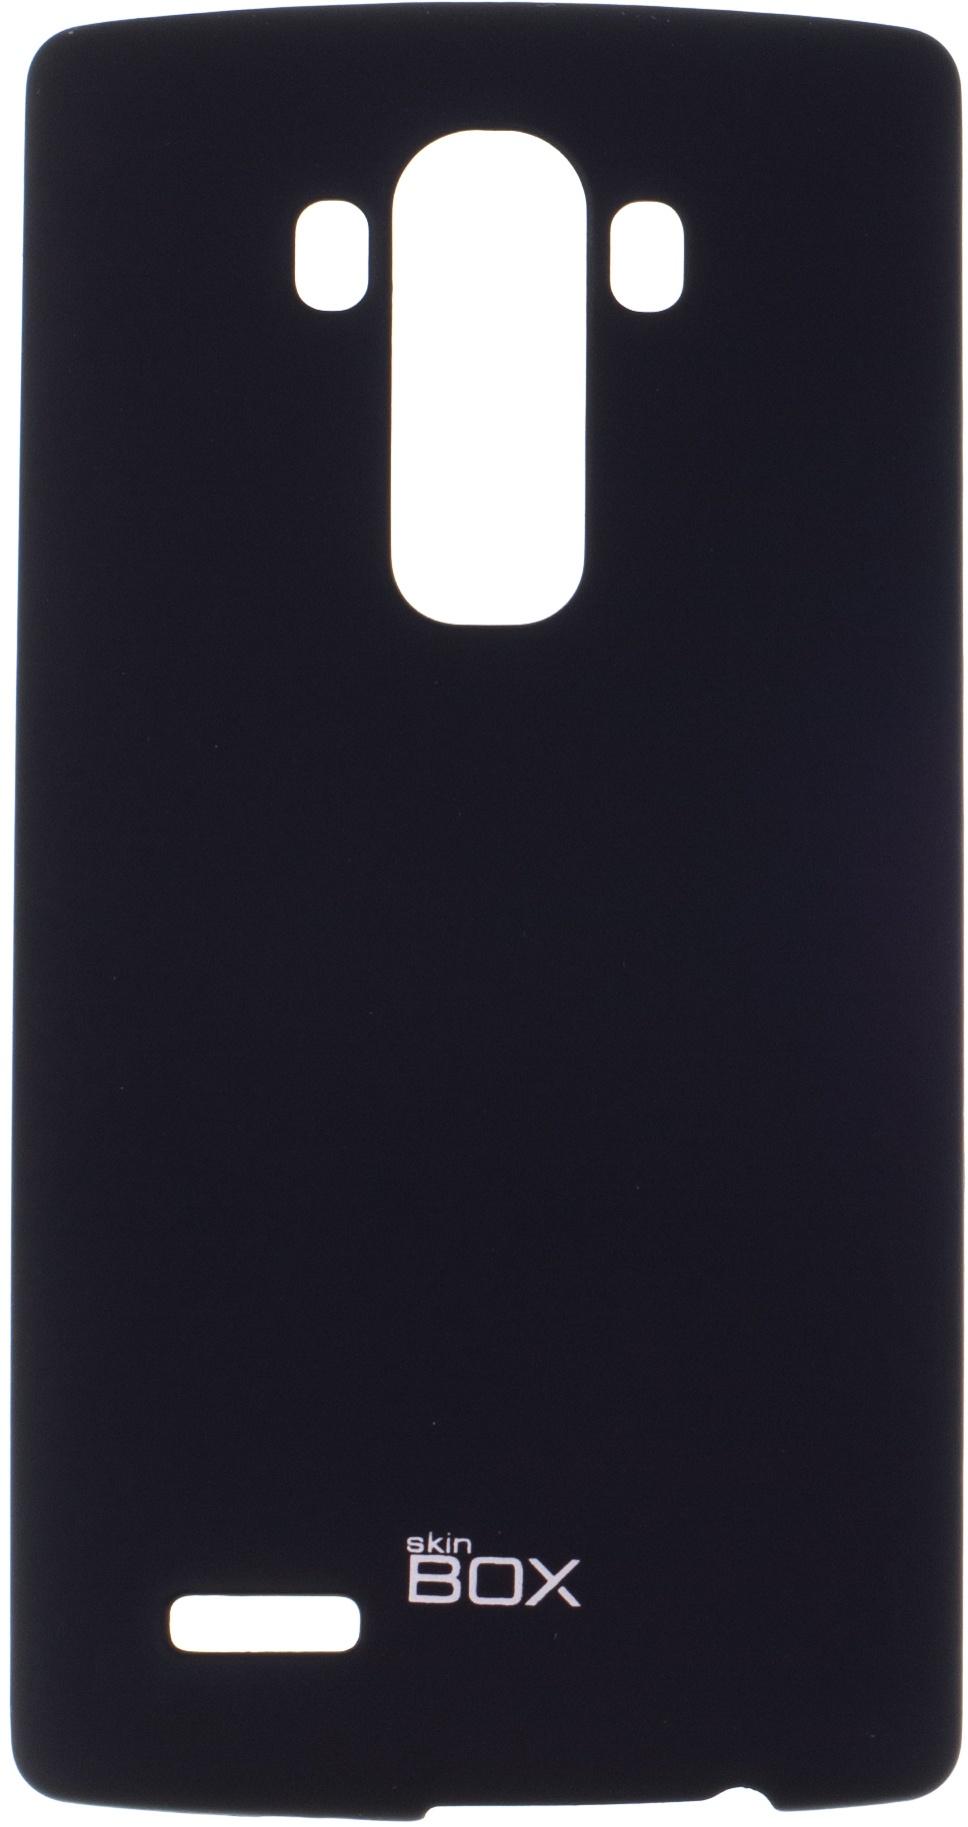 Накладка skinBOX для LG G4, 2000000076430, черный накладка skinbox для lg g4s 2000000079226 черный